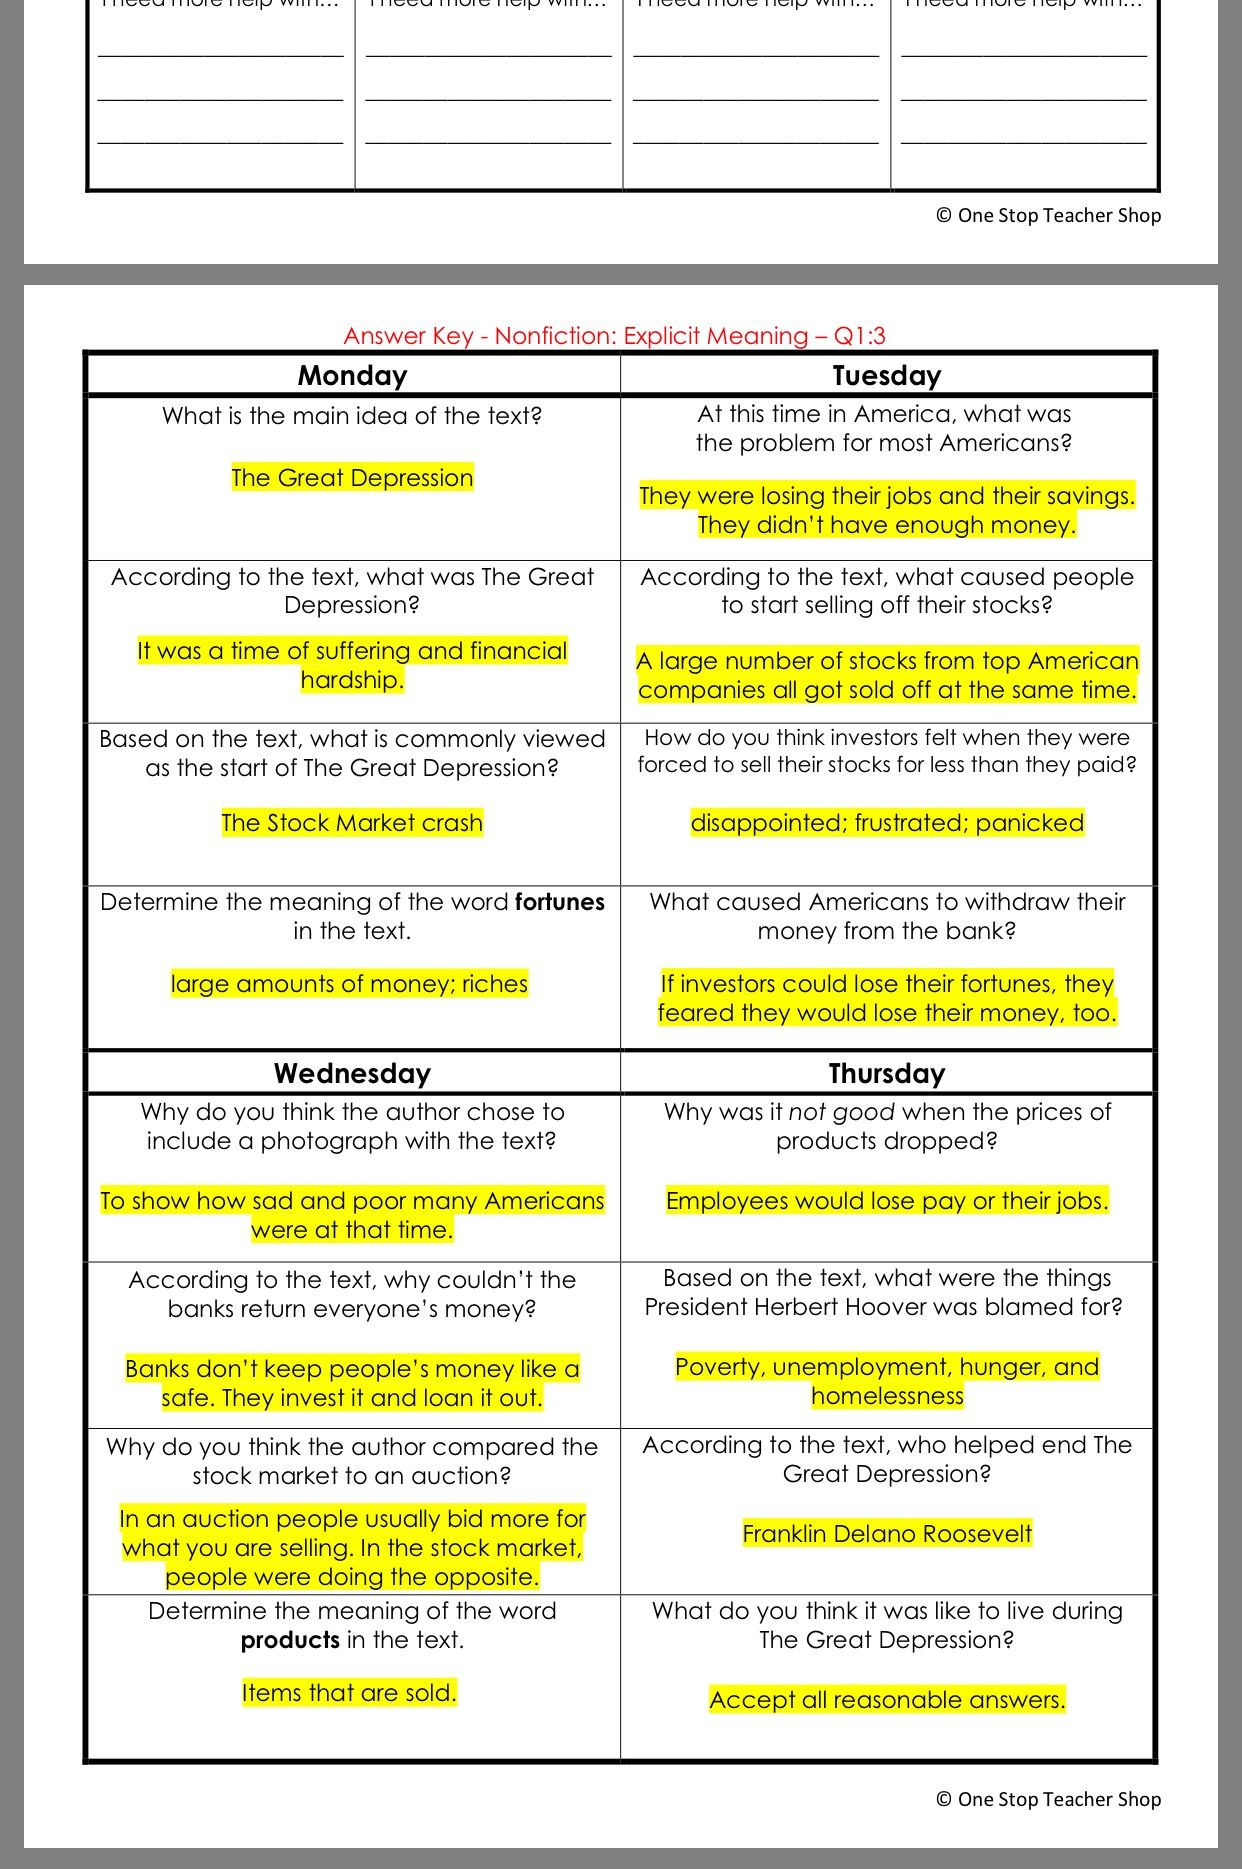 30 Free Fall Worksheet Answers